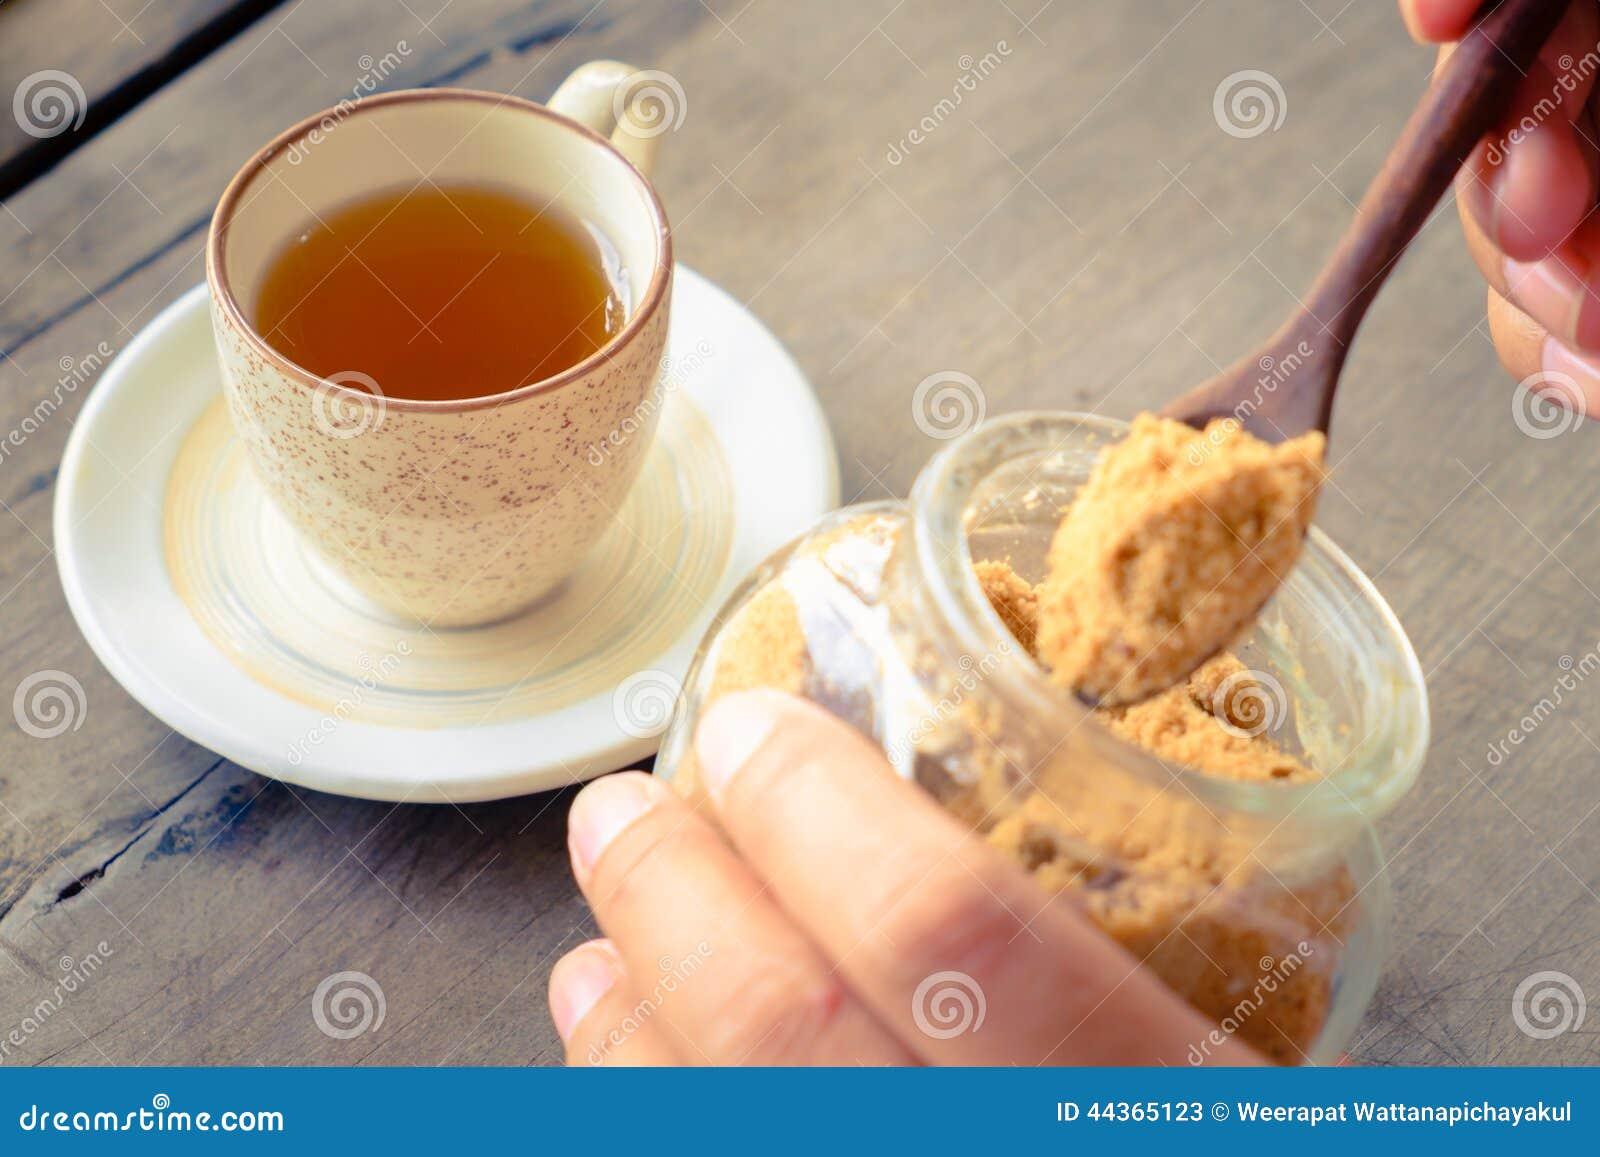 Tè con zucchero